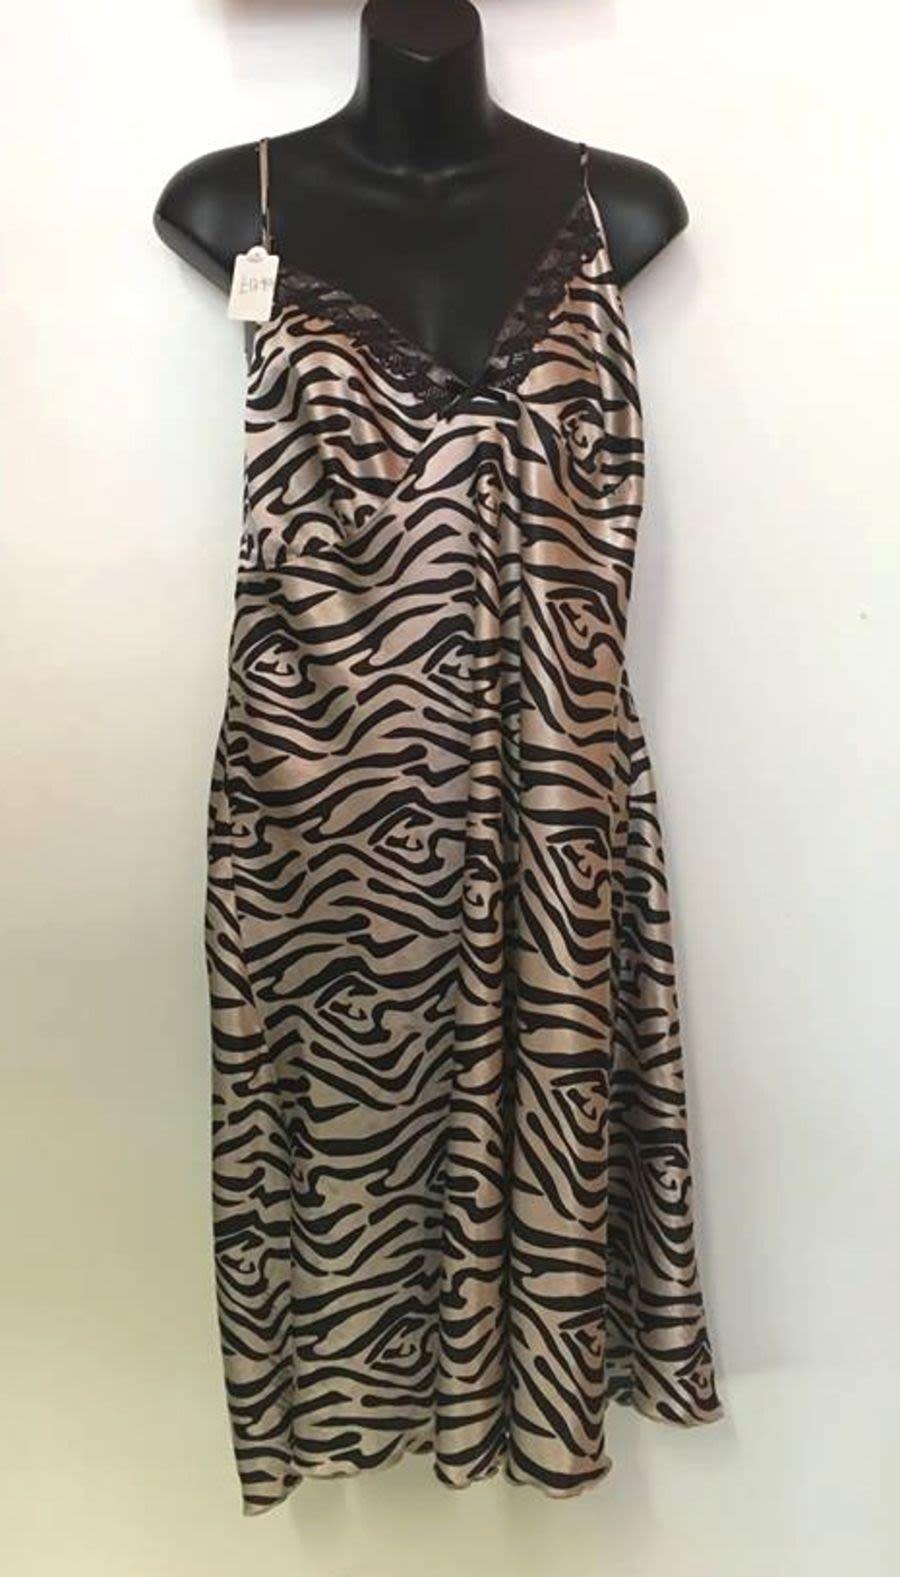 Vintage 1990's Zebra Print Silk Slip Dress